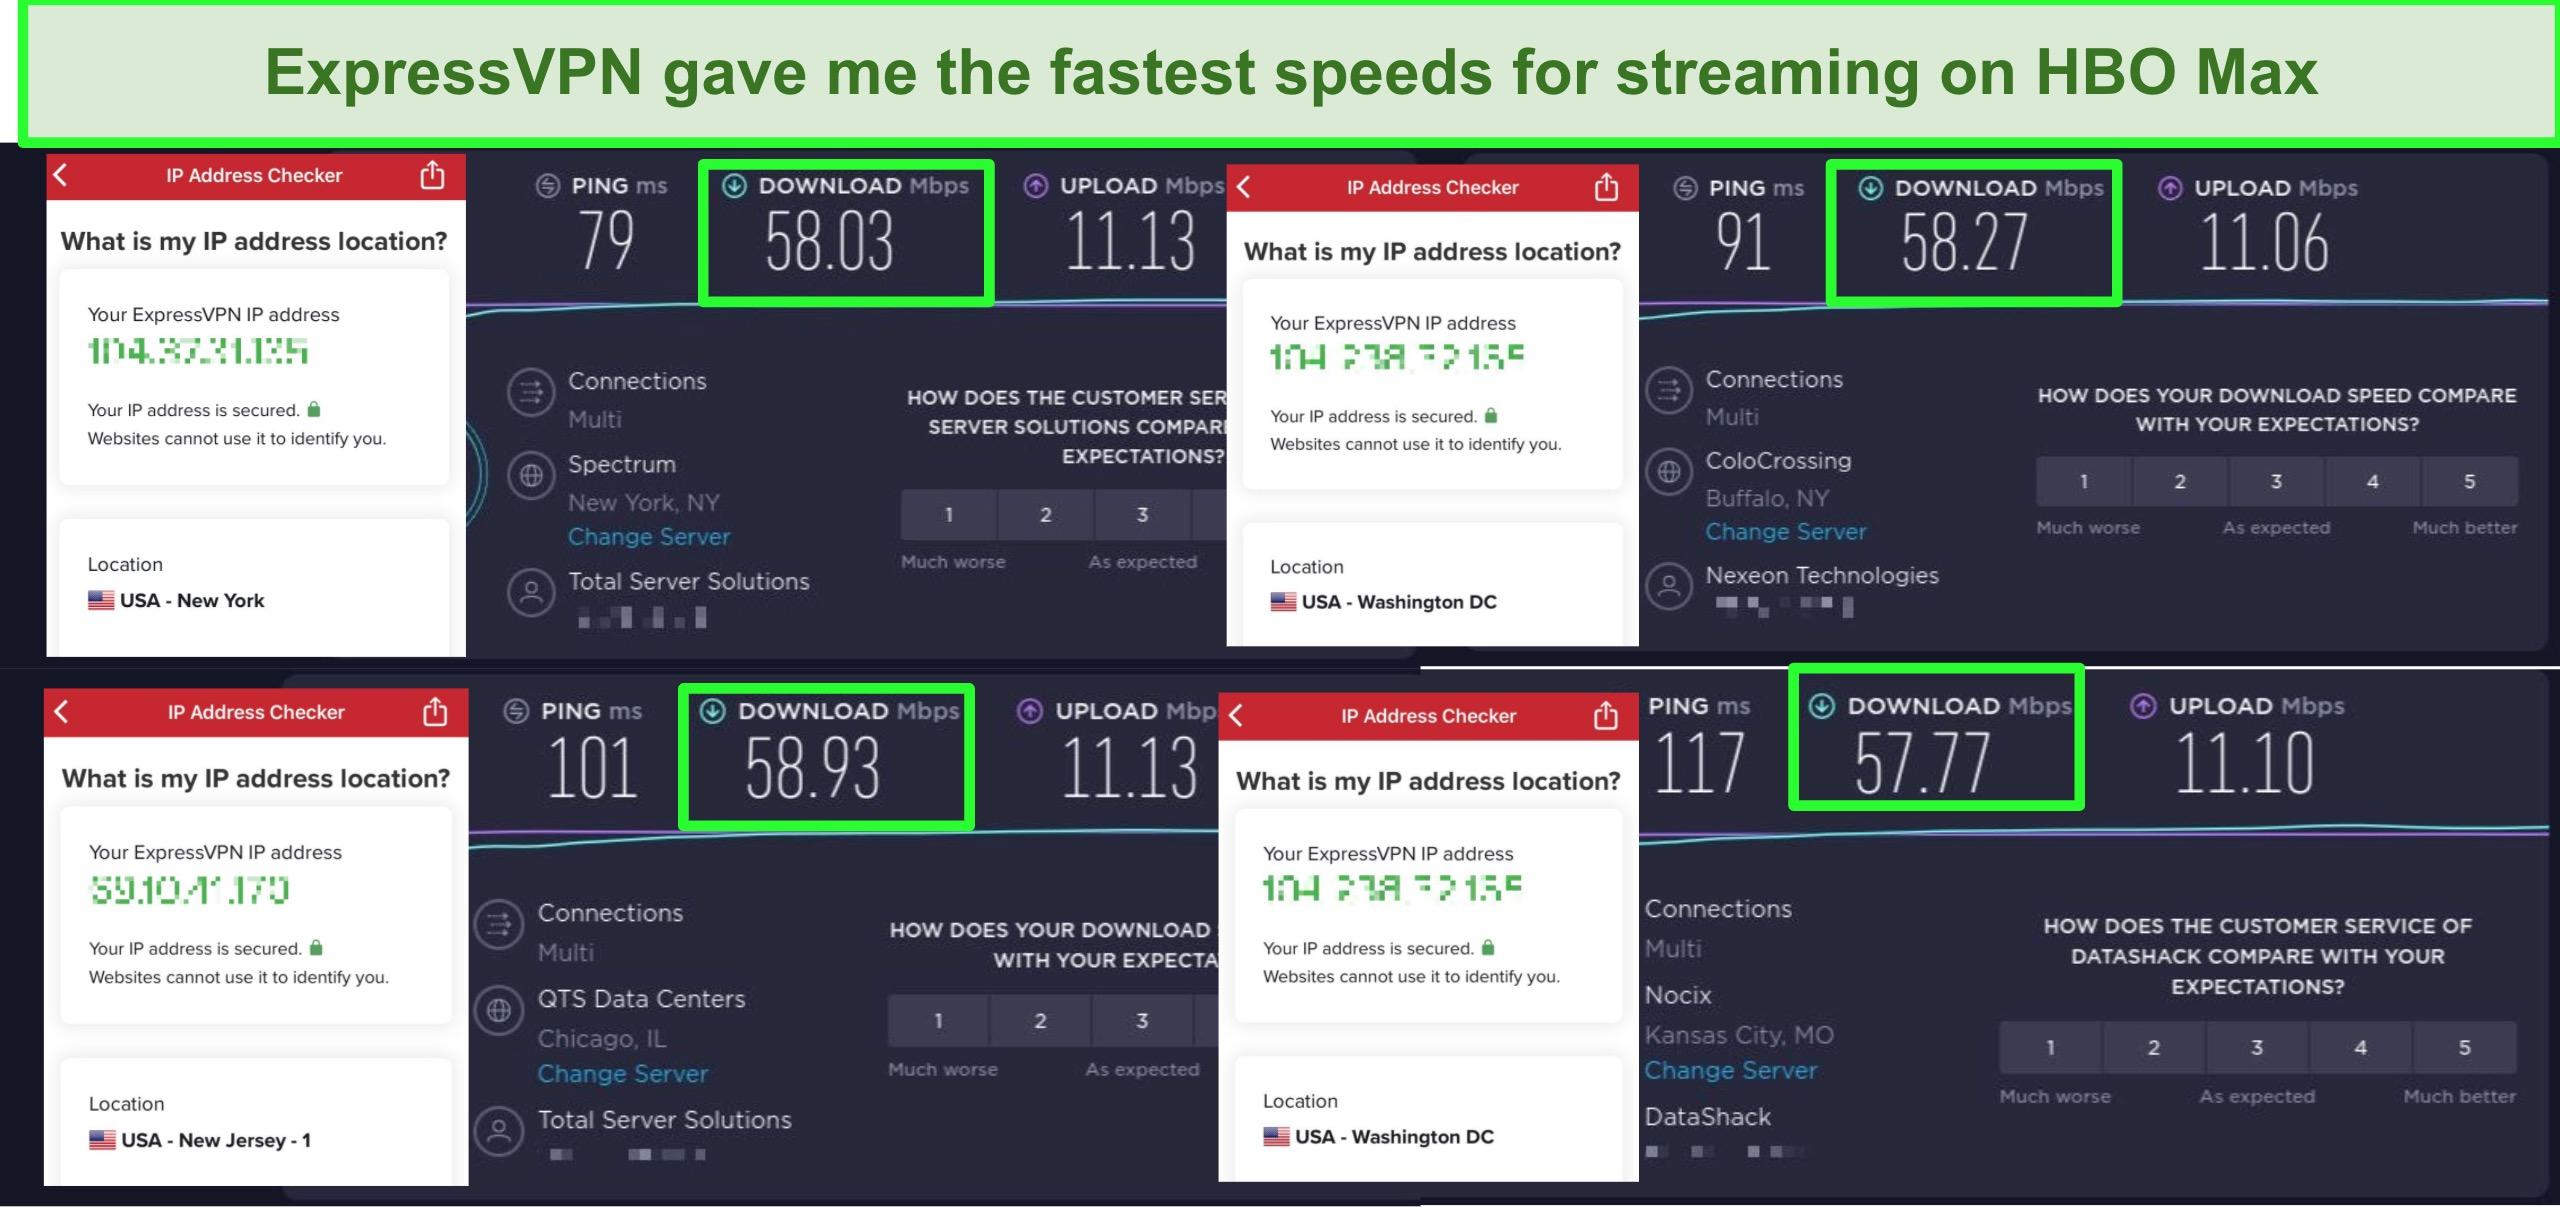 Screenshot of ExpressVPN speed tests